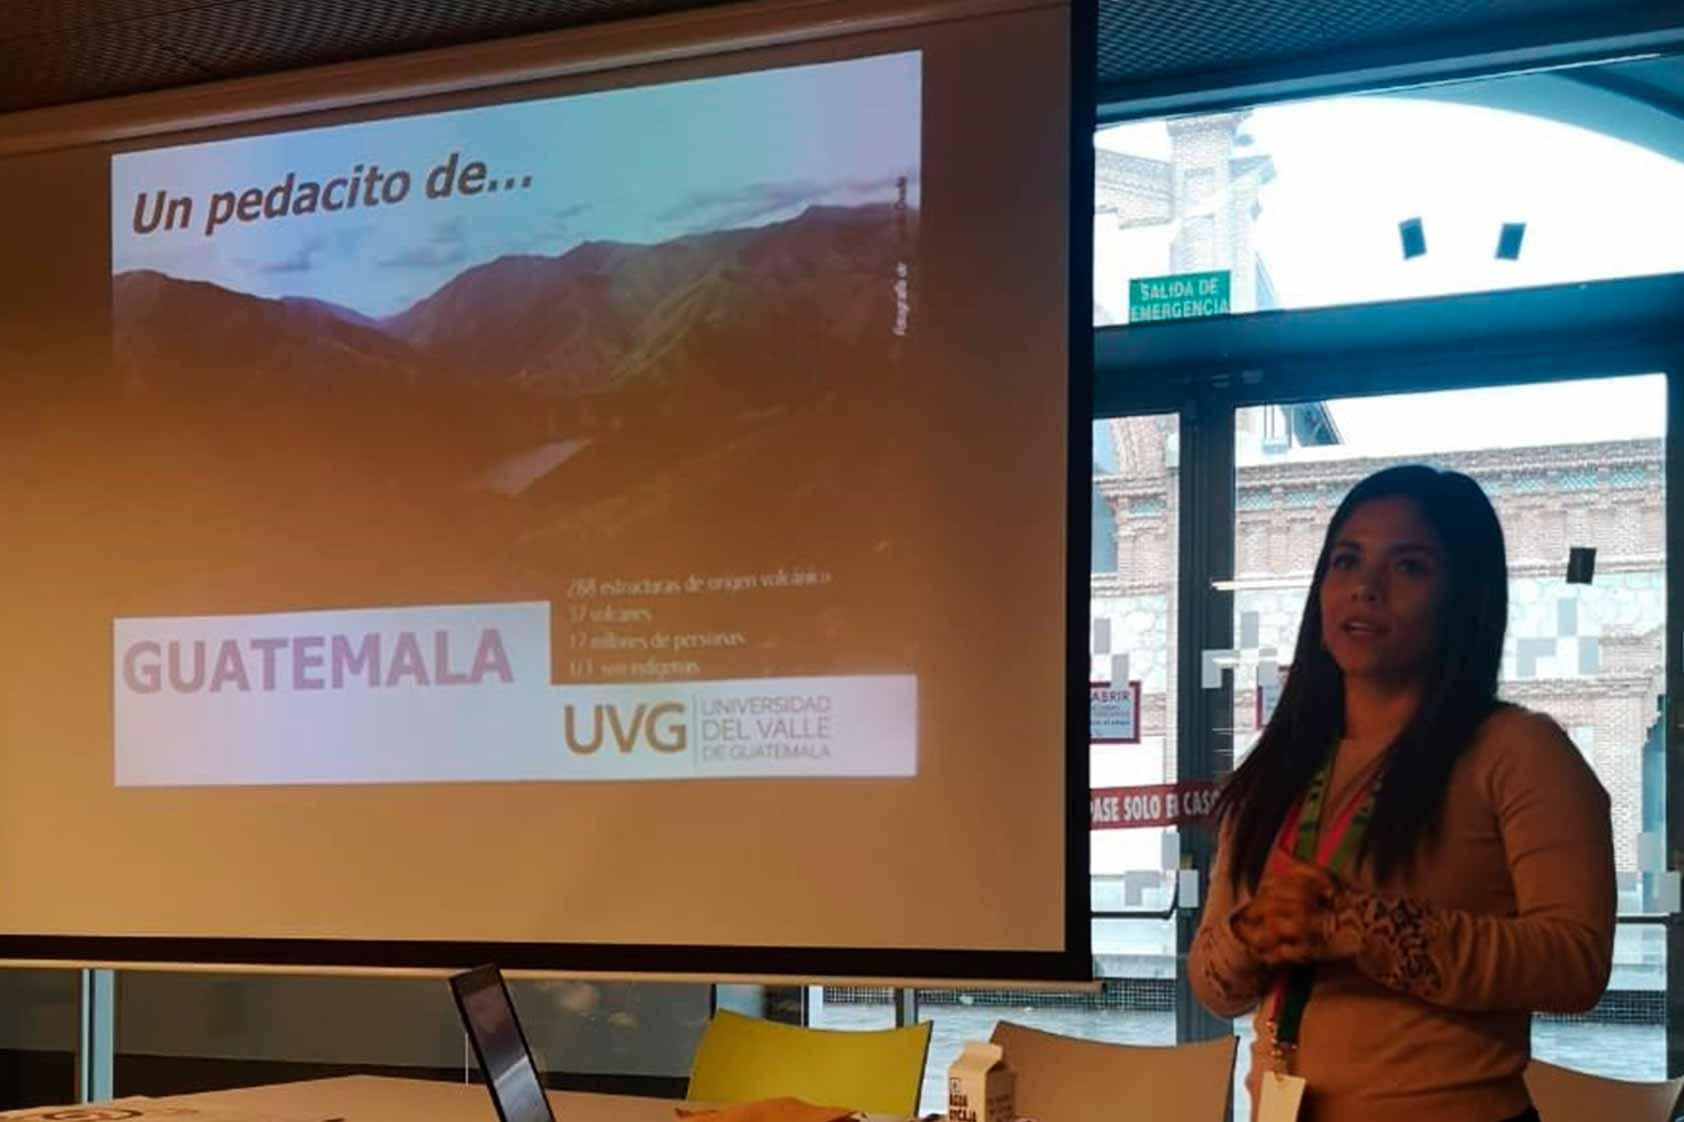 ¡UVG participa en la Bienal Iberoamericana del Diseño!